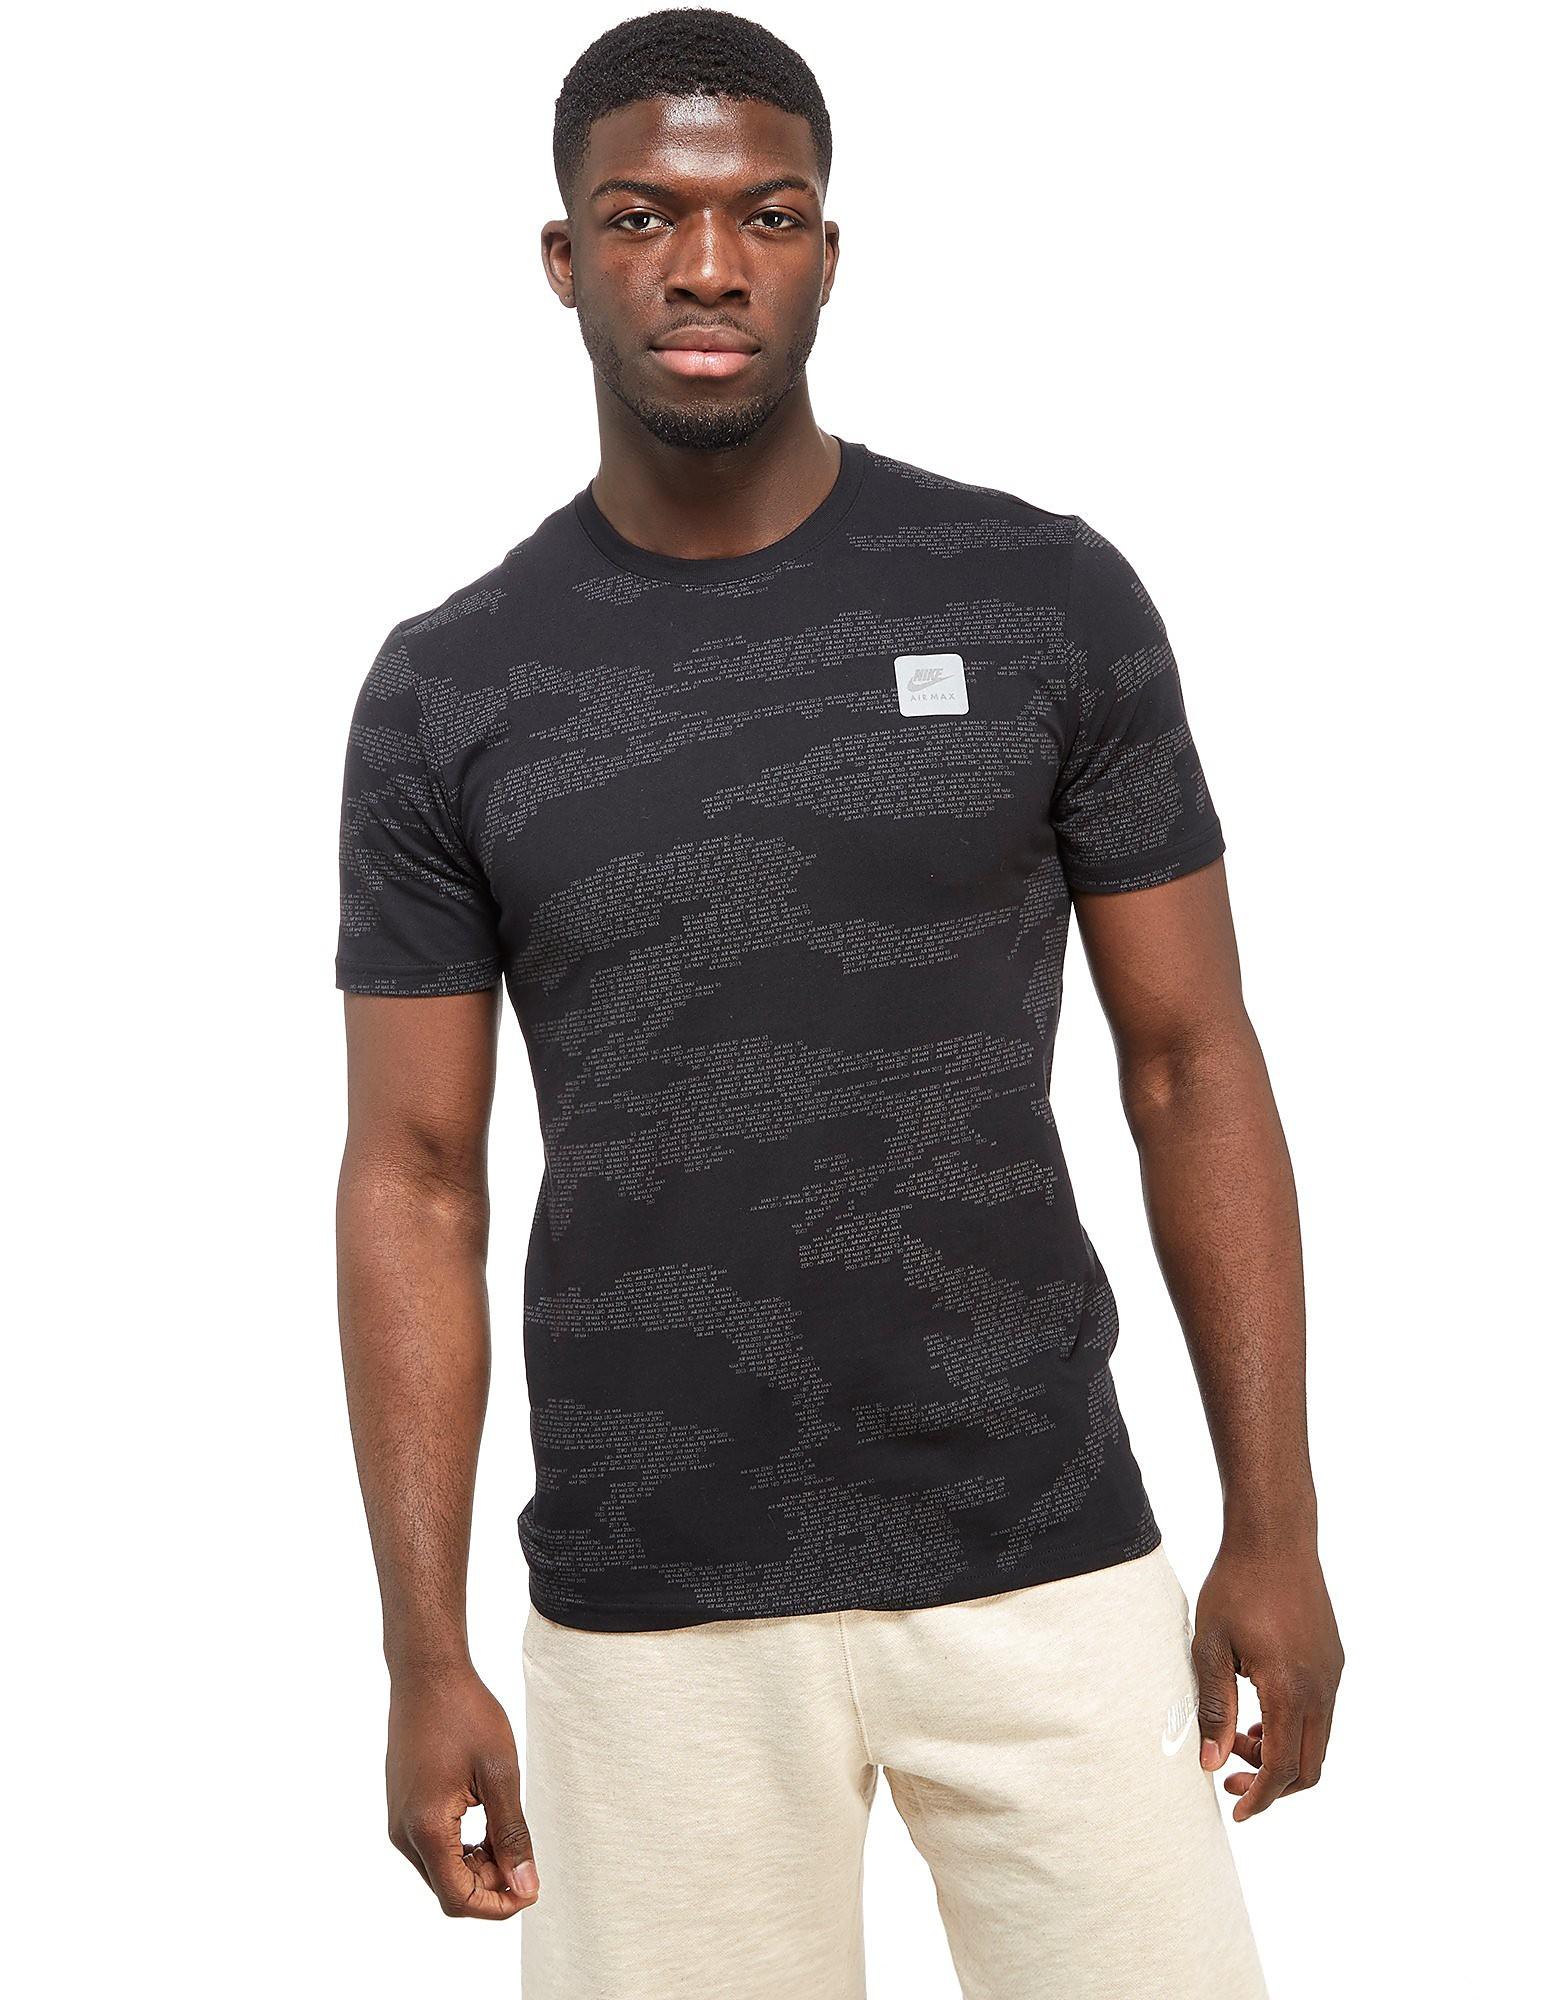 Nike Air Max All Over Print T-Shirt